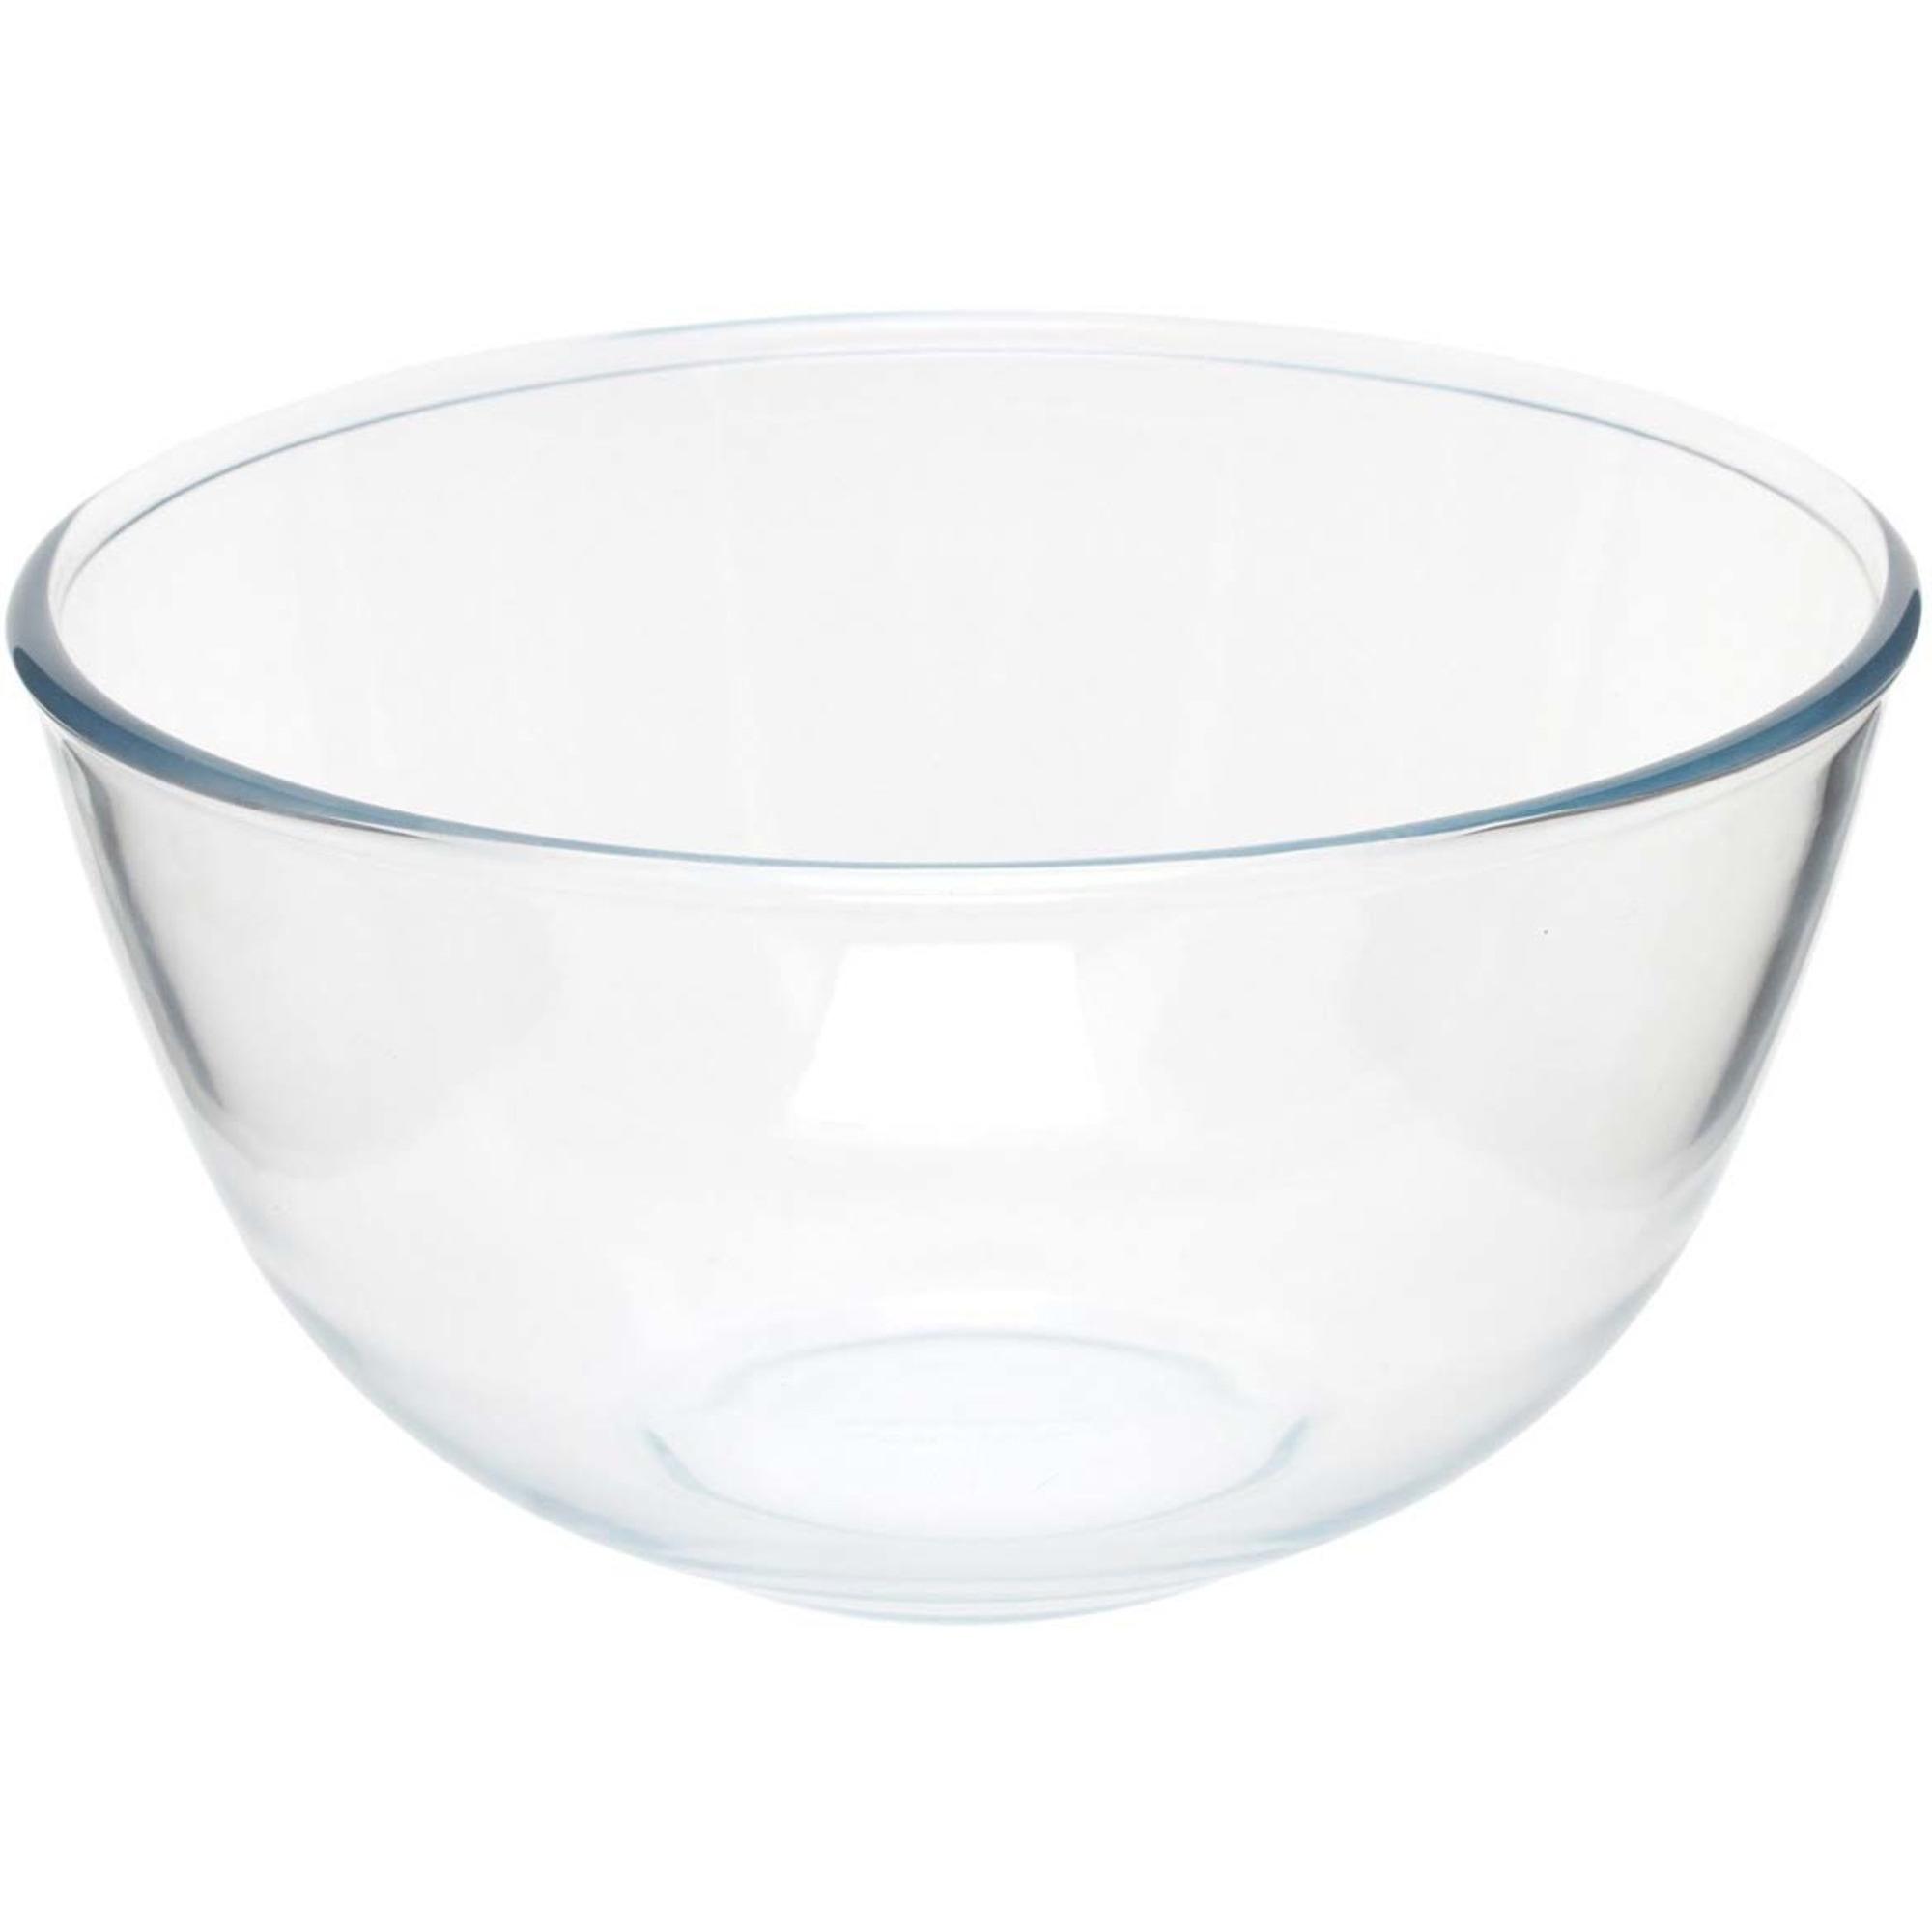 Pyrex Classic Glasskål 3 liter